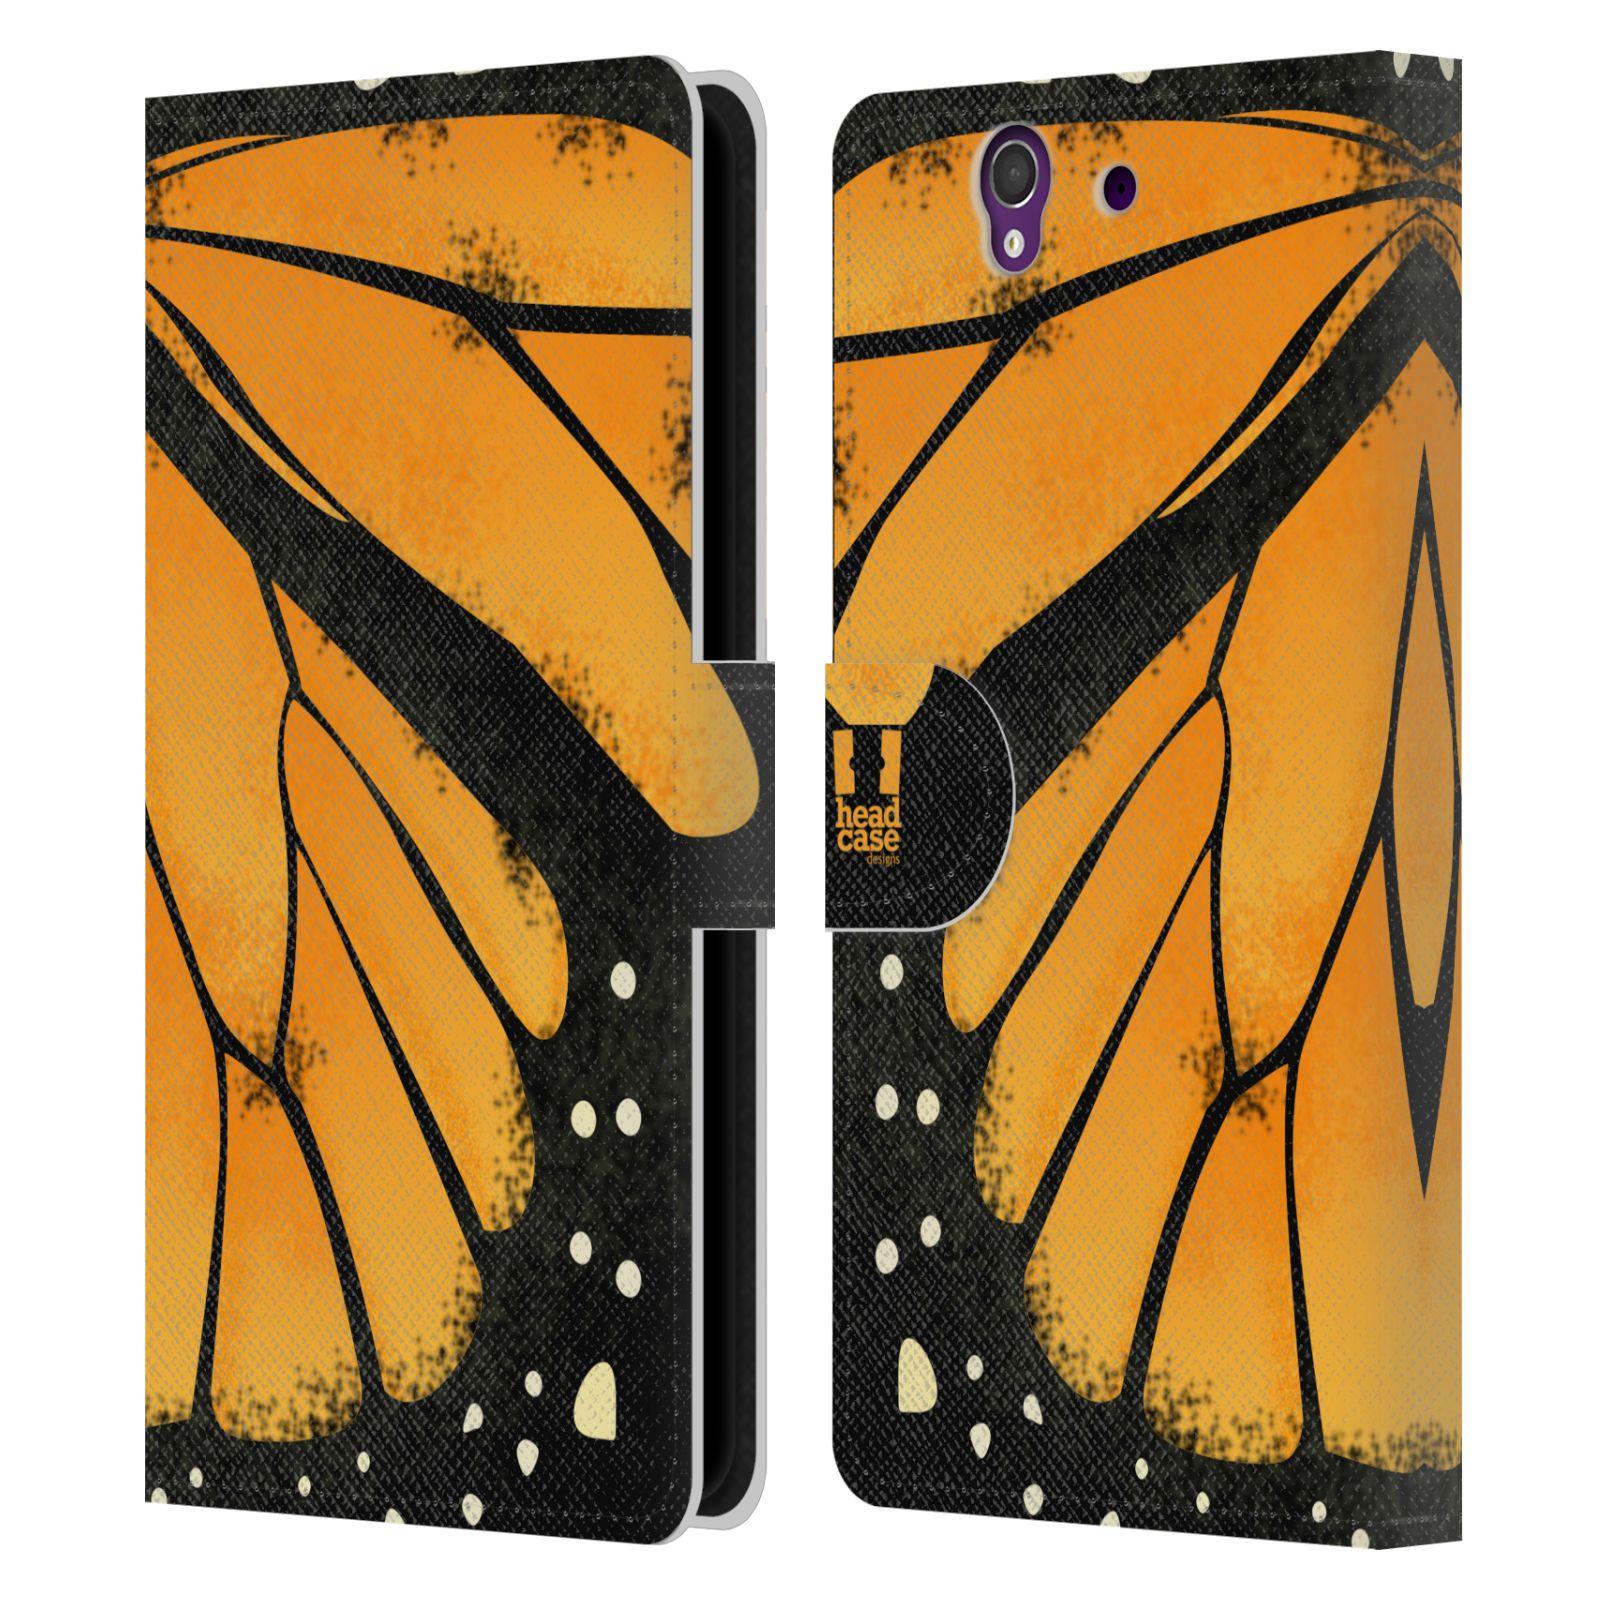 HEAD CASE Flipové pouzdro pro mobil SONY XPERIA Z (C6603) motýl a křídla kreslený vzor MONARCHA žlutá